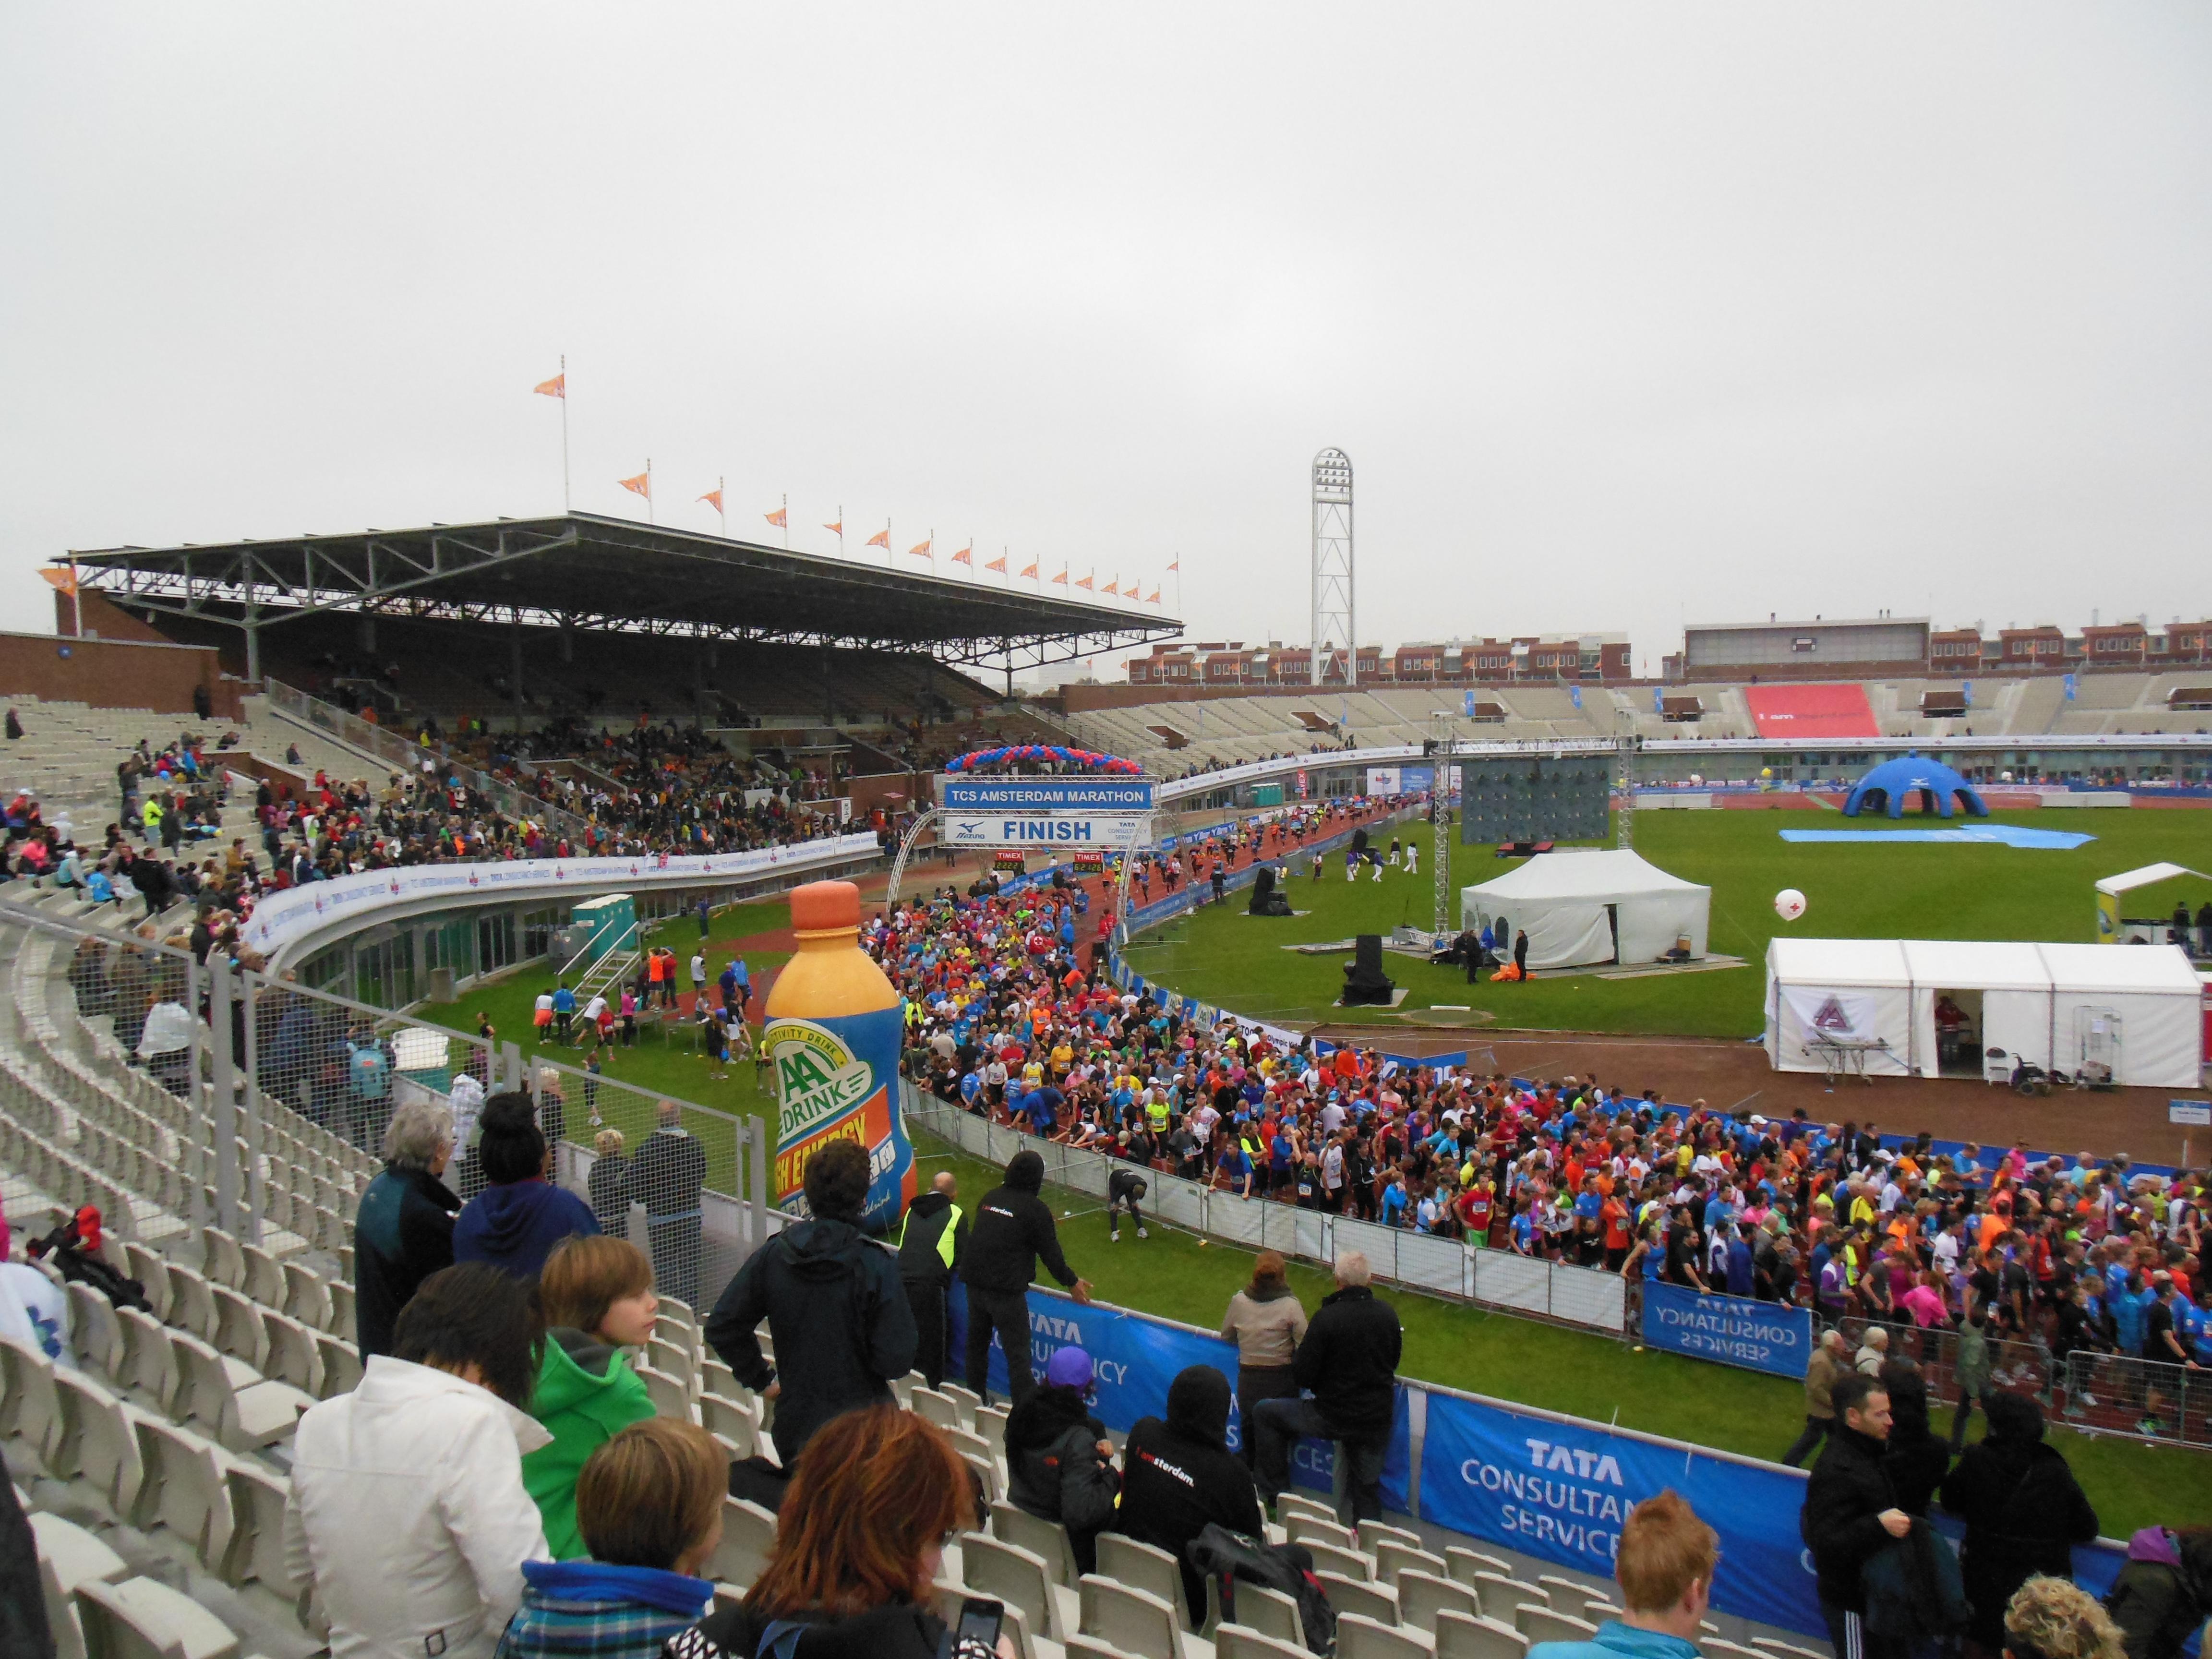 Finish at Olympic stadium